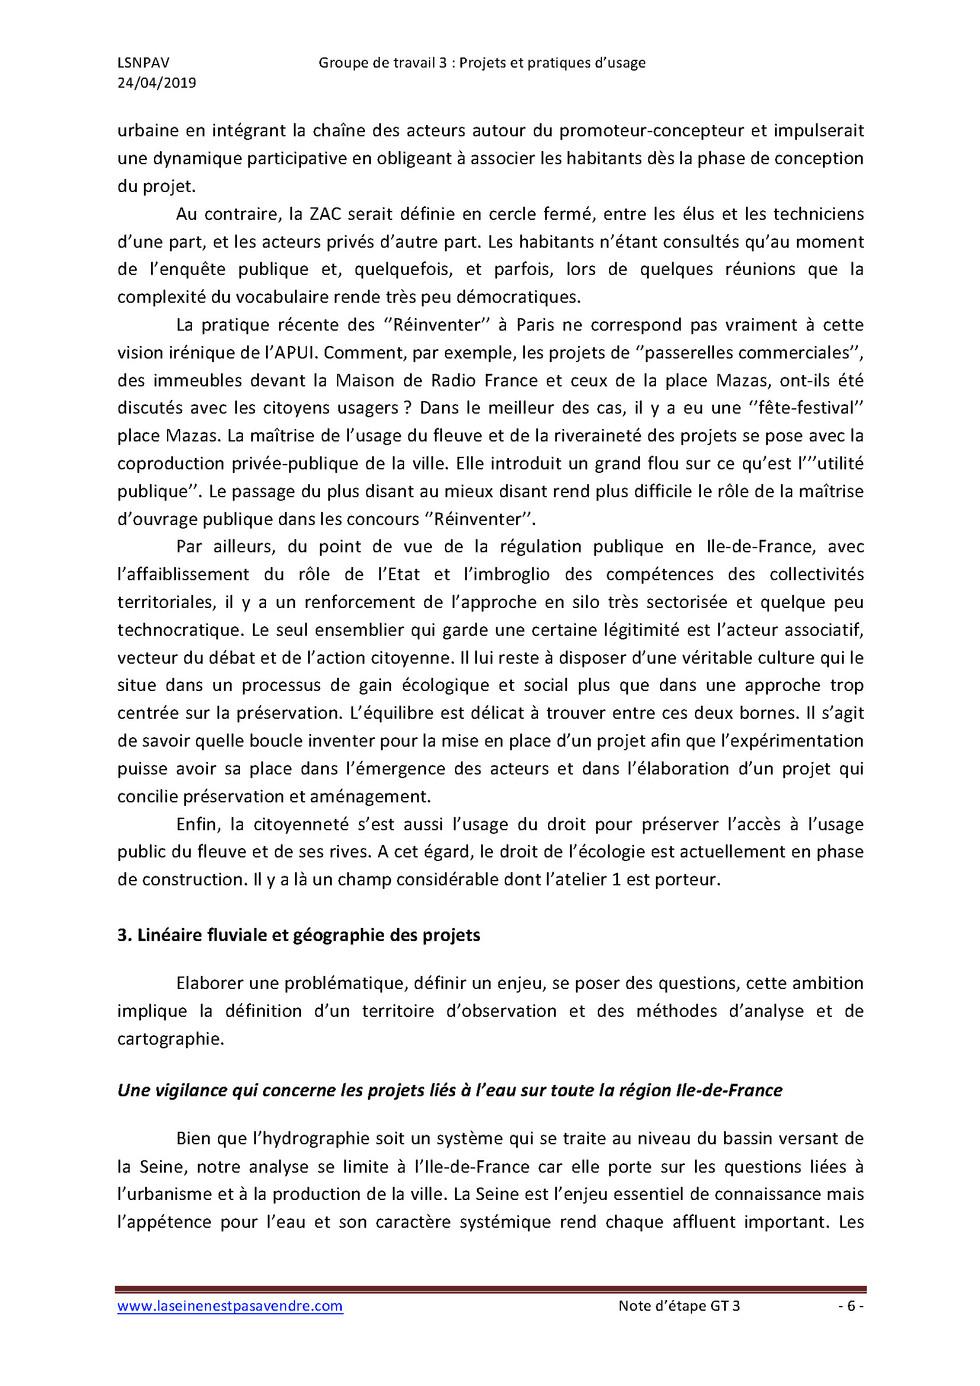 GT 3 Note d'étape_Page_06.jpg